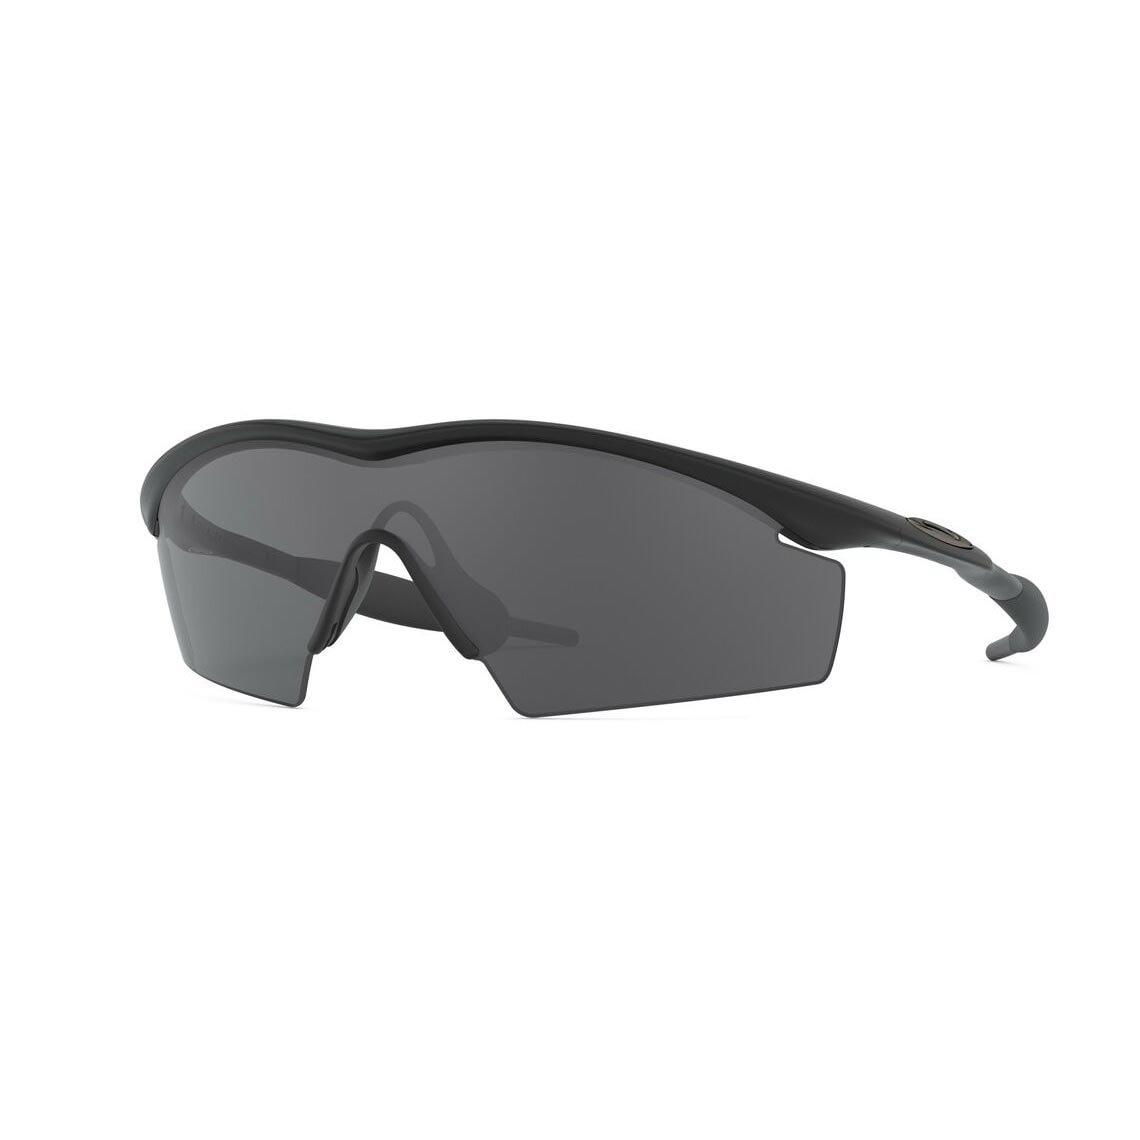 Oakley M Frame Grey OO9060 11-162